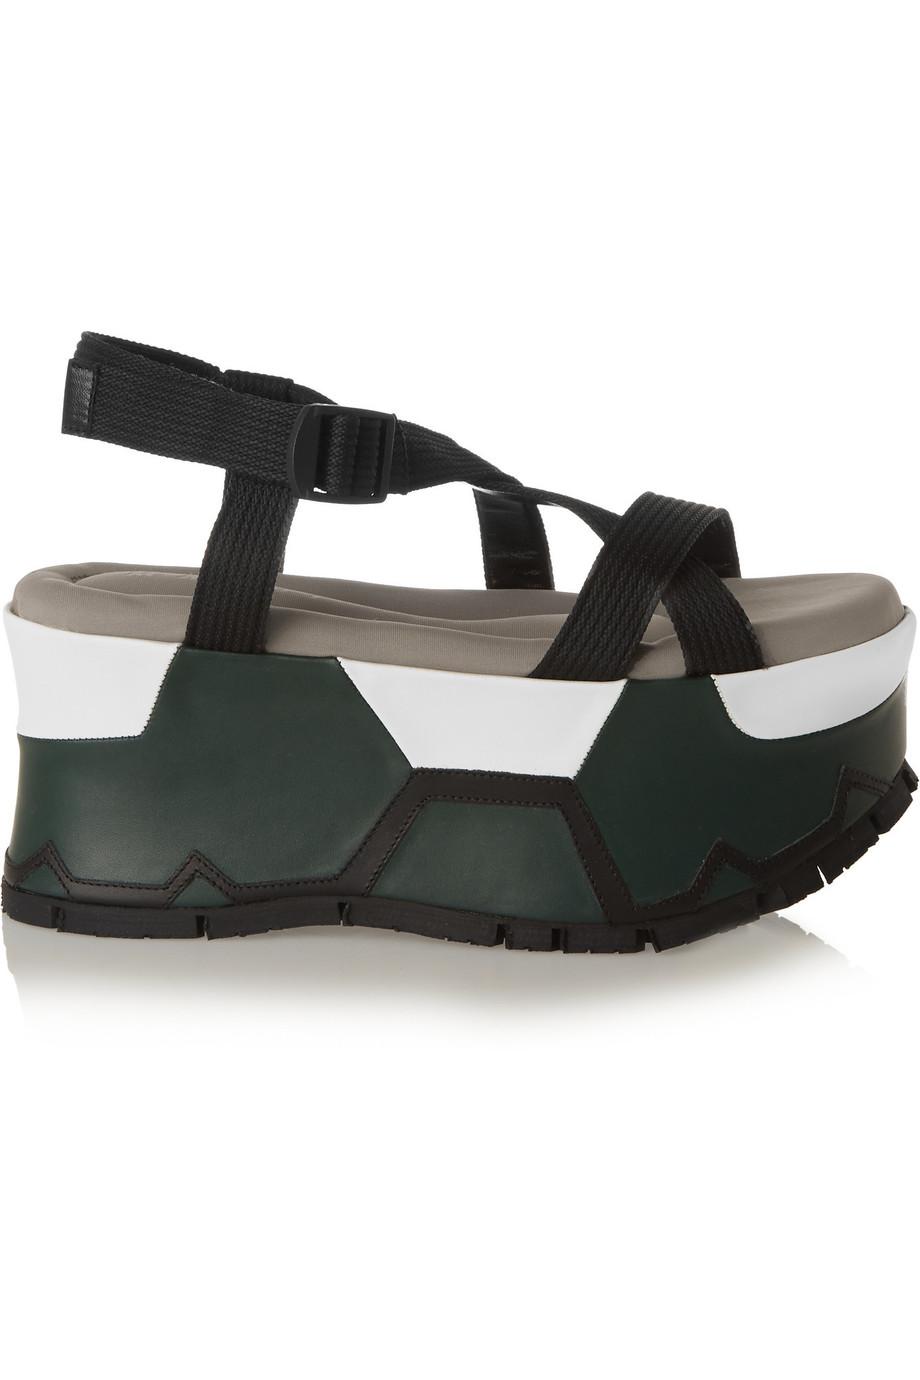 MARNI Canvas Platform Sandals in Black